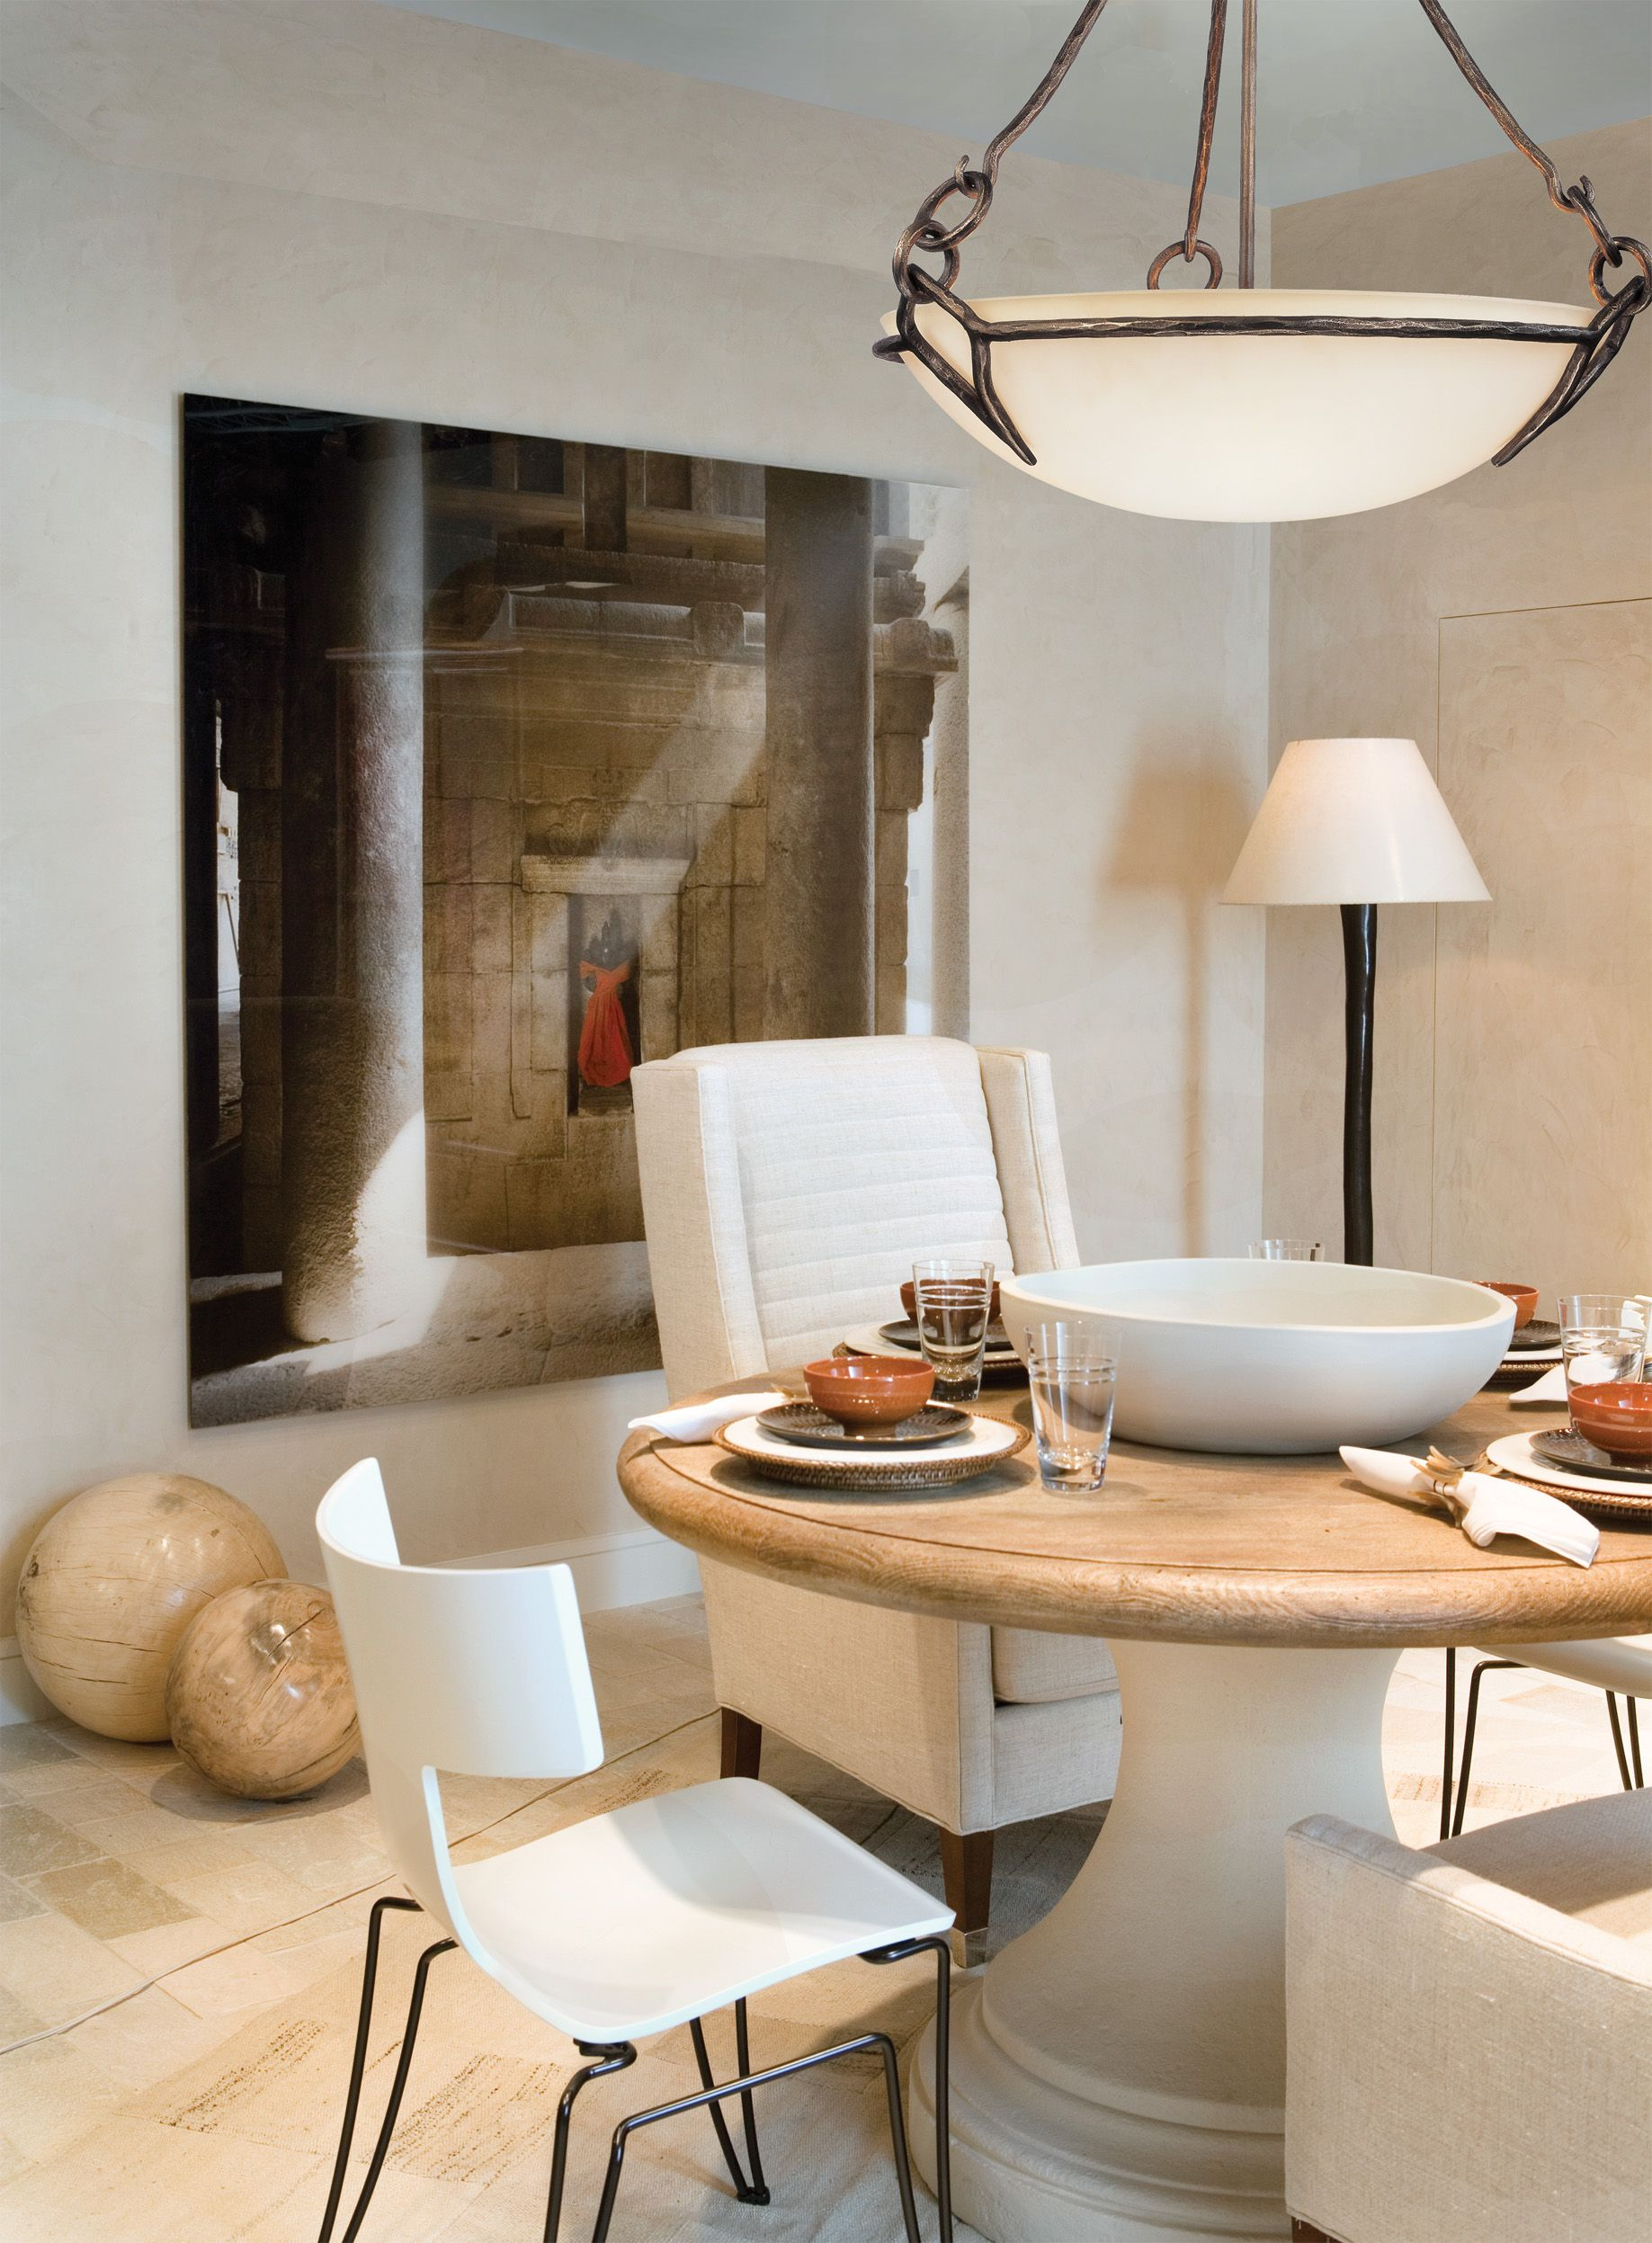 luxury lighting direct. Luxury Lighting Direct - Troy Pompeii Collection T